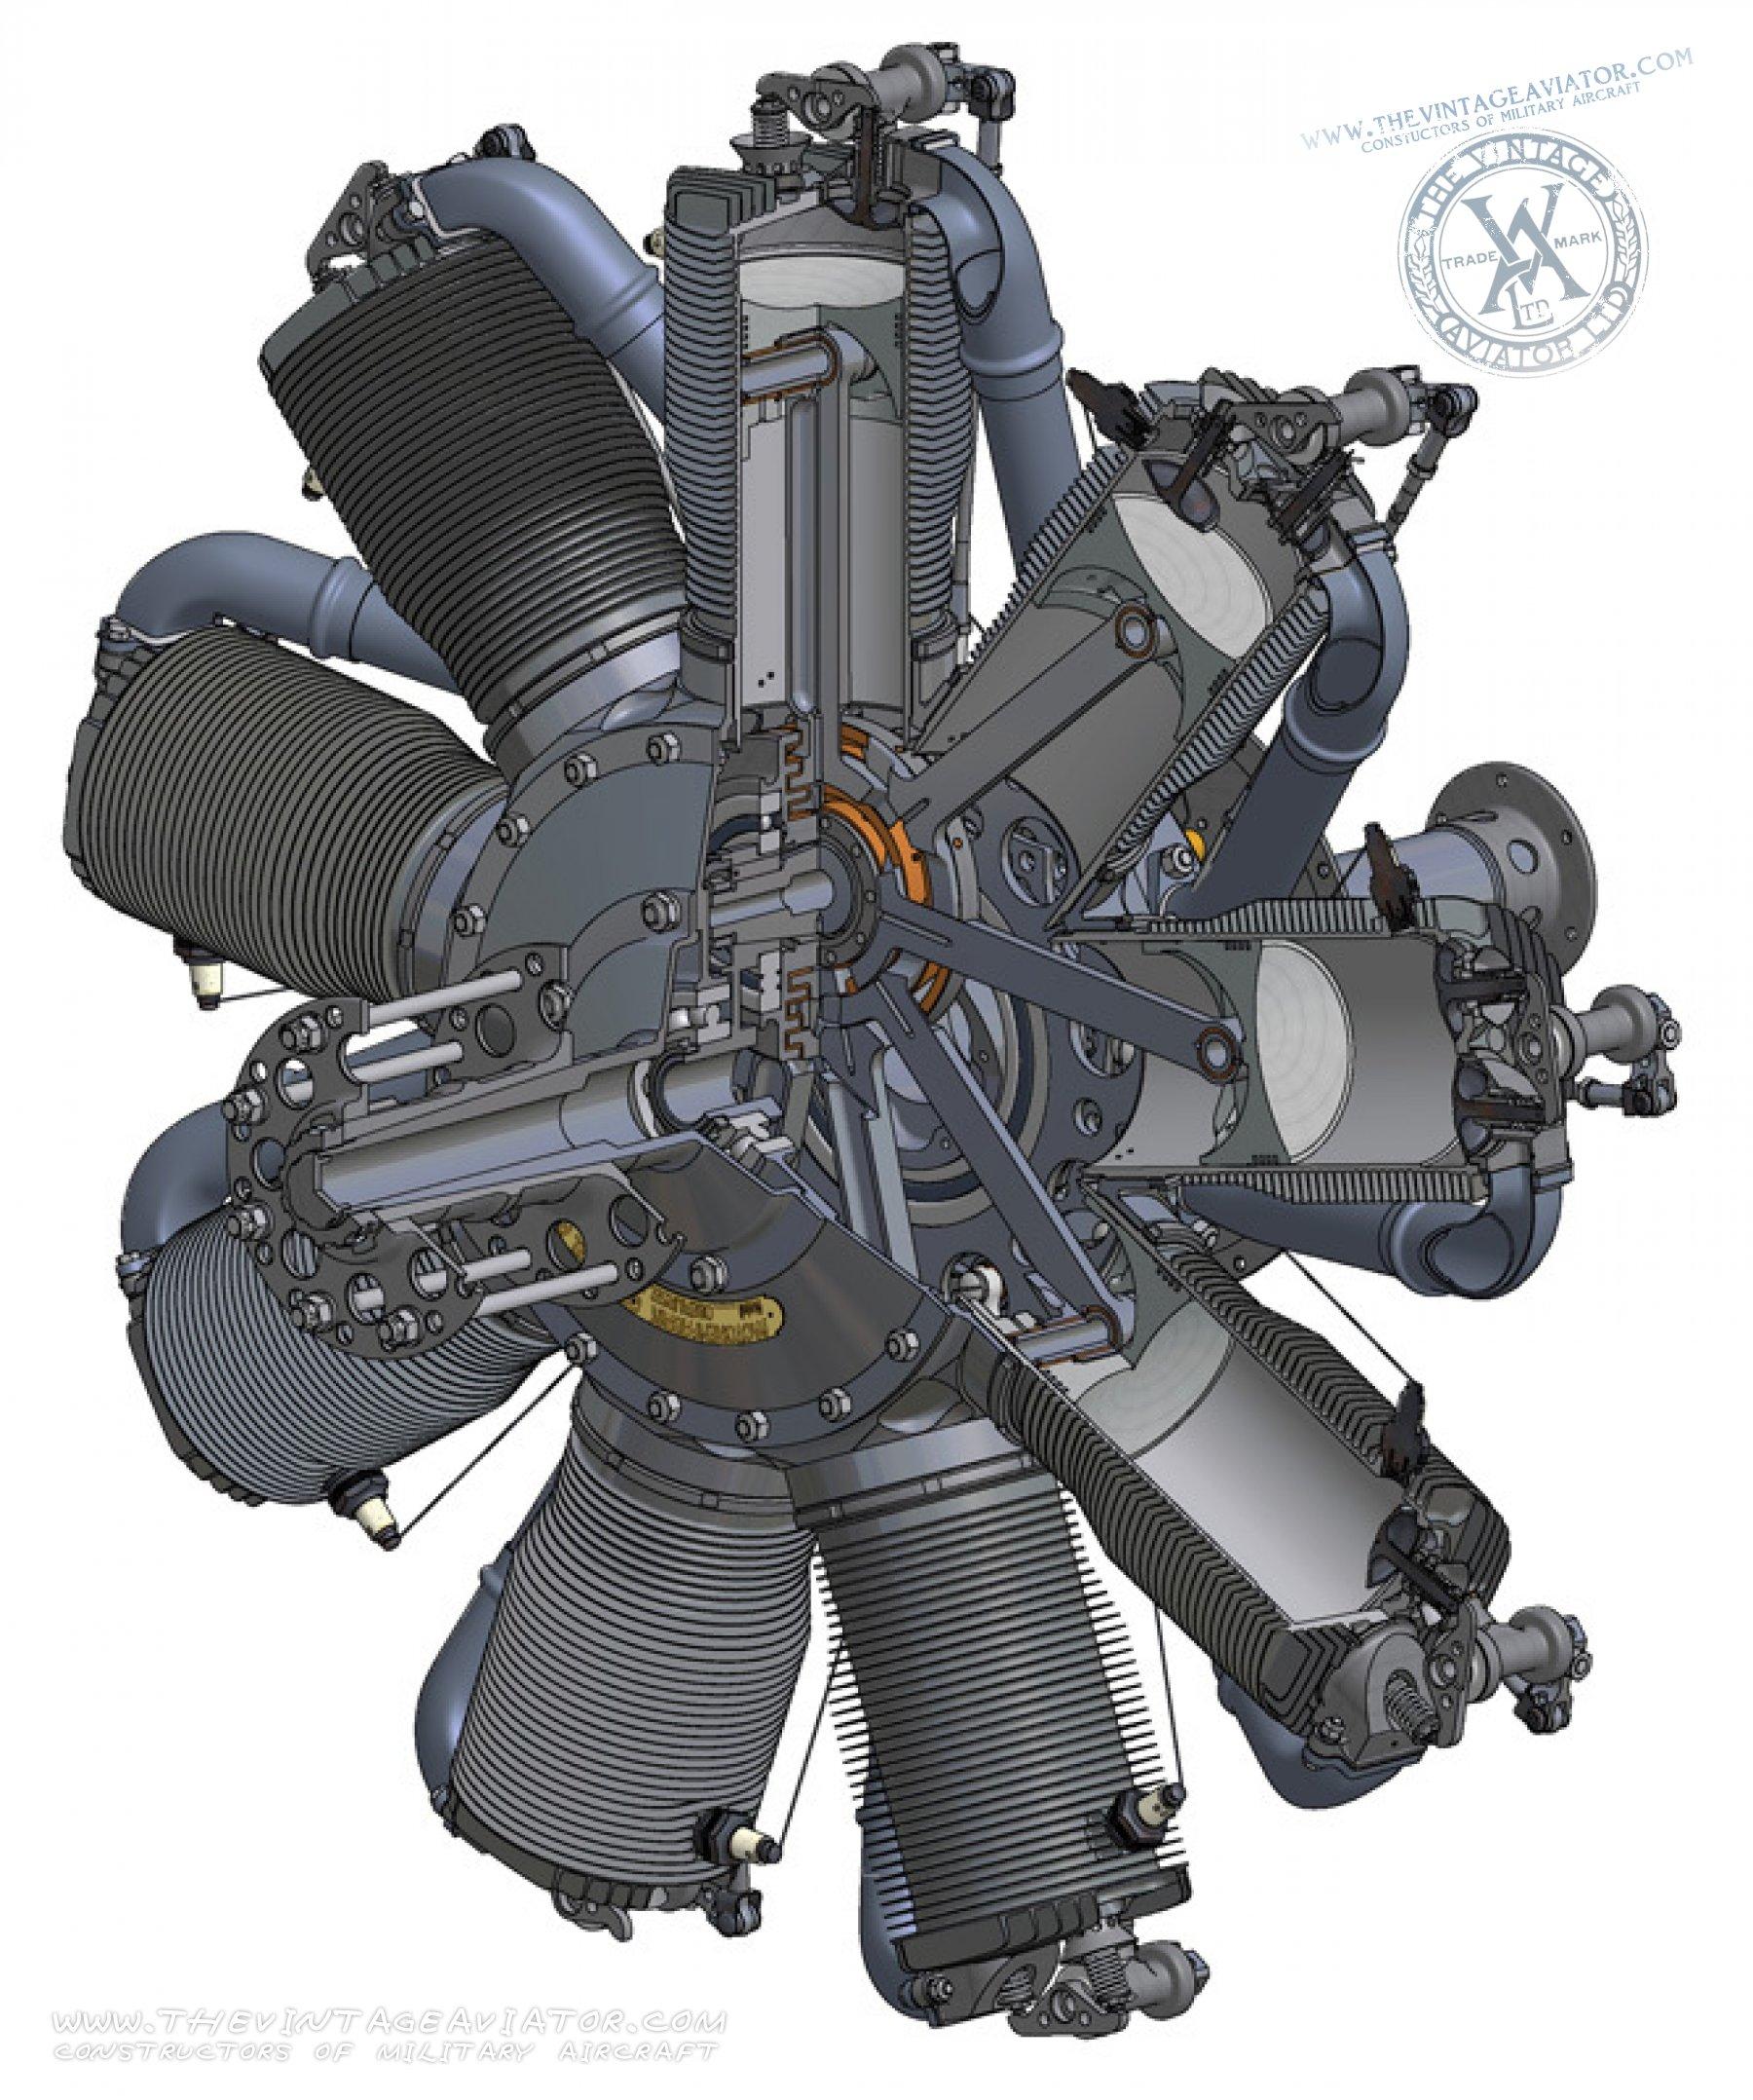 Oberursel UR II Engine | The Vintage Aviator